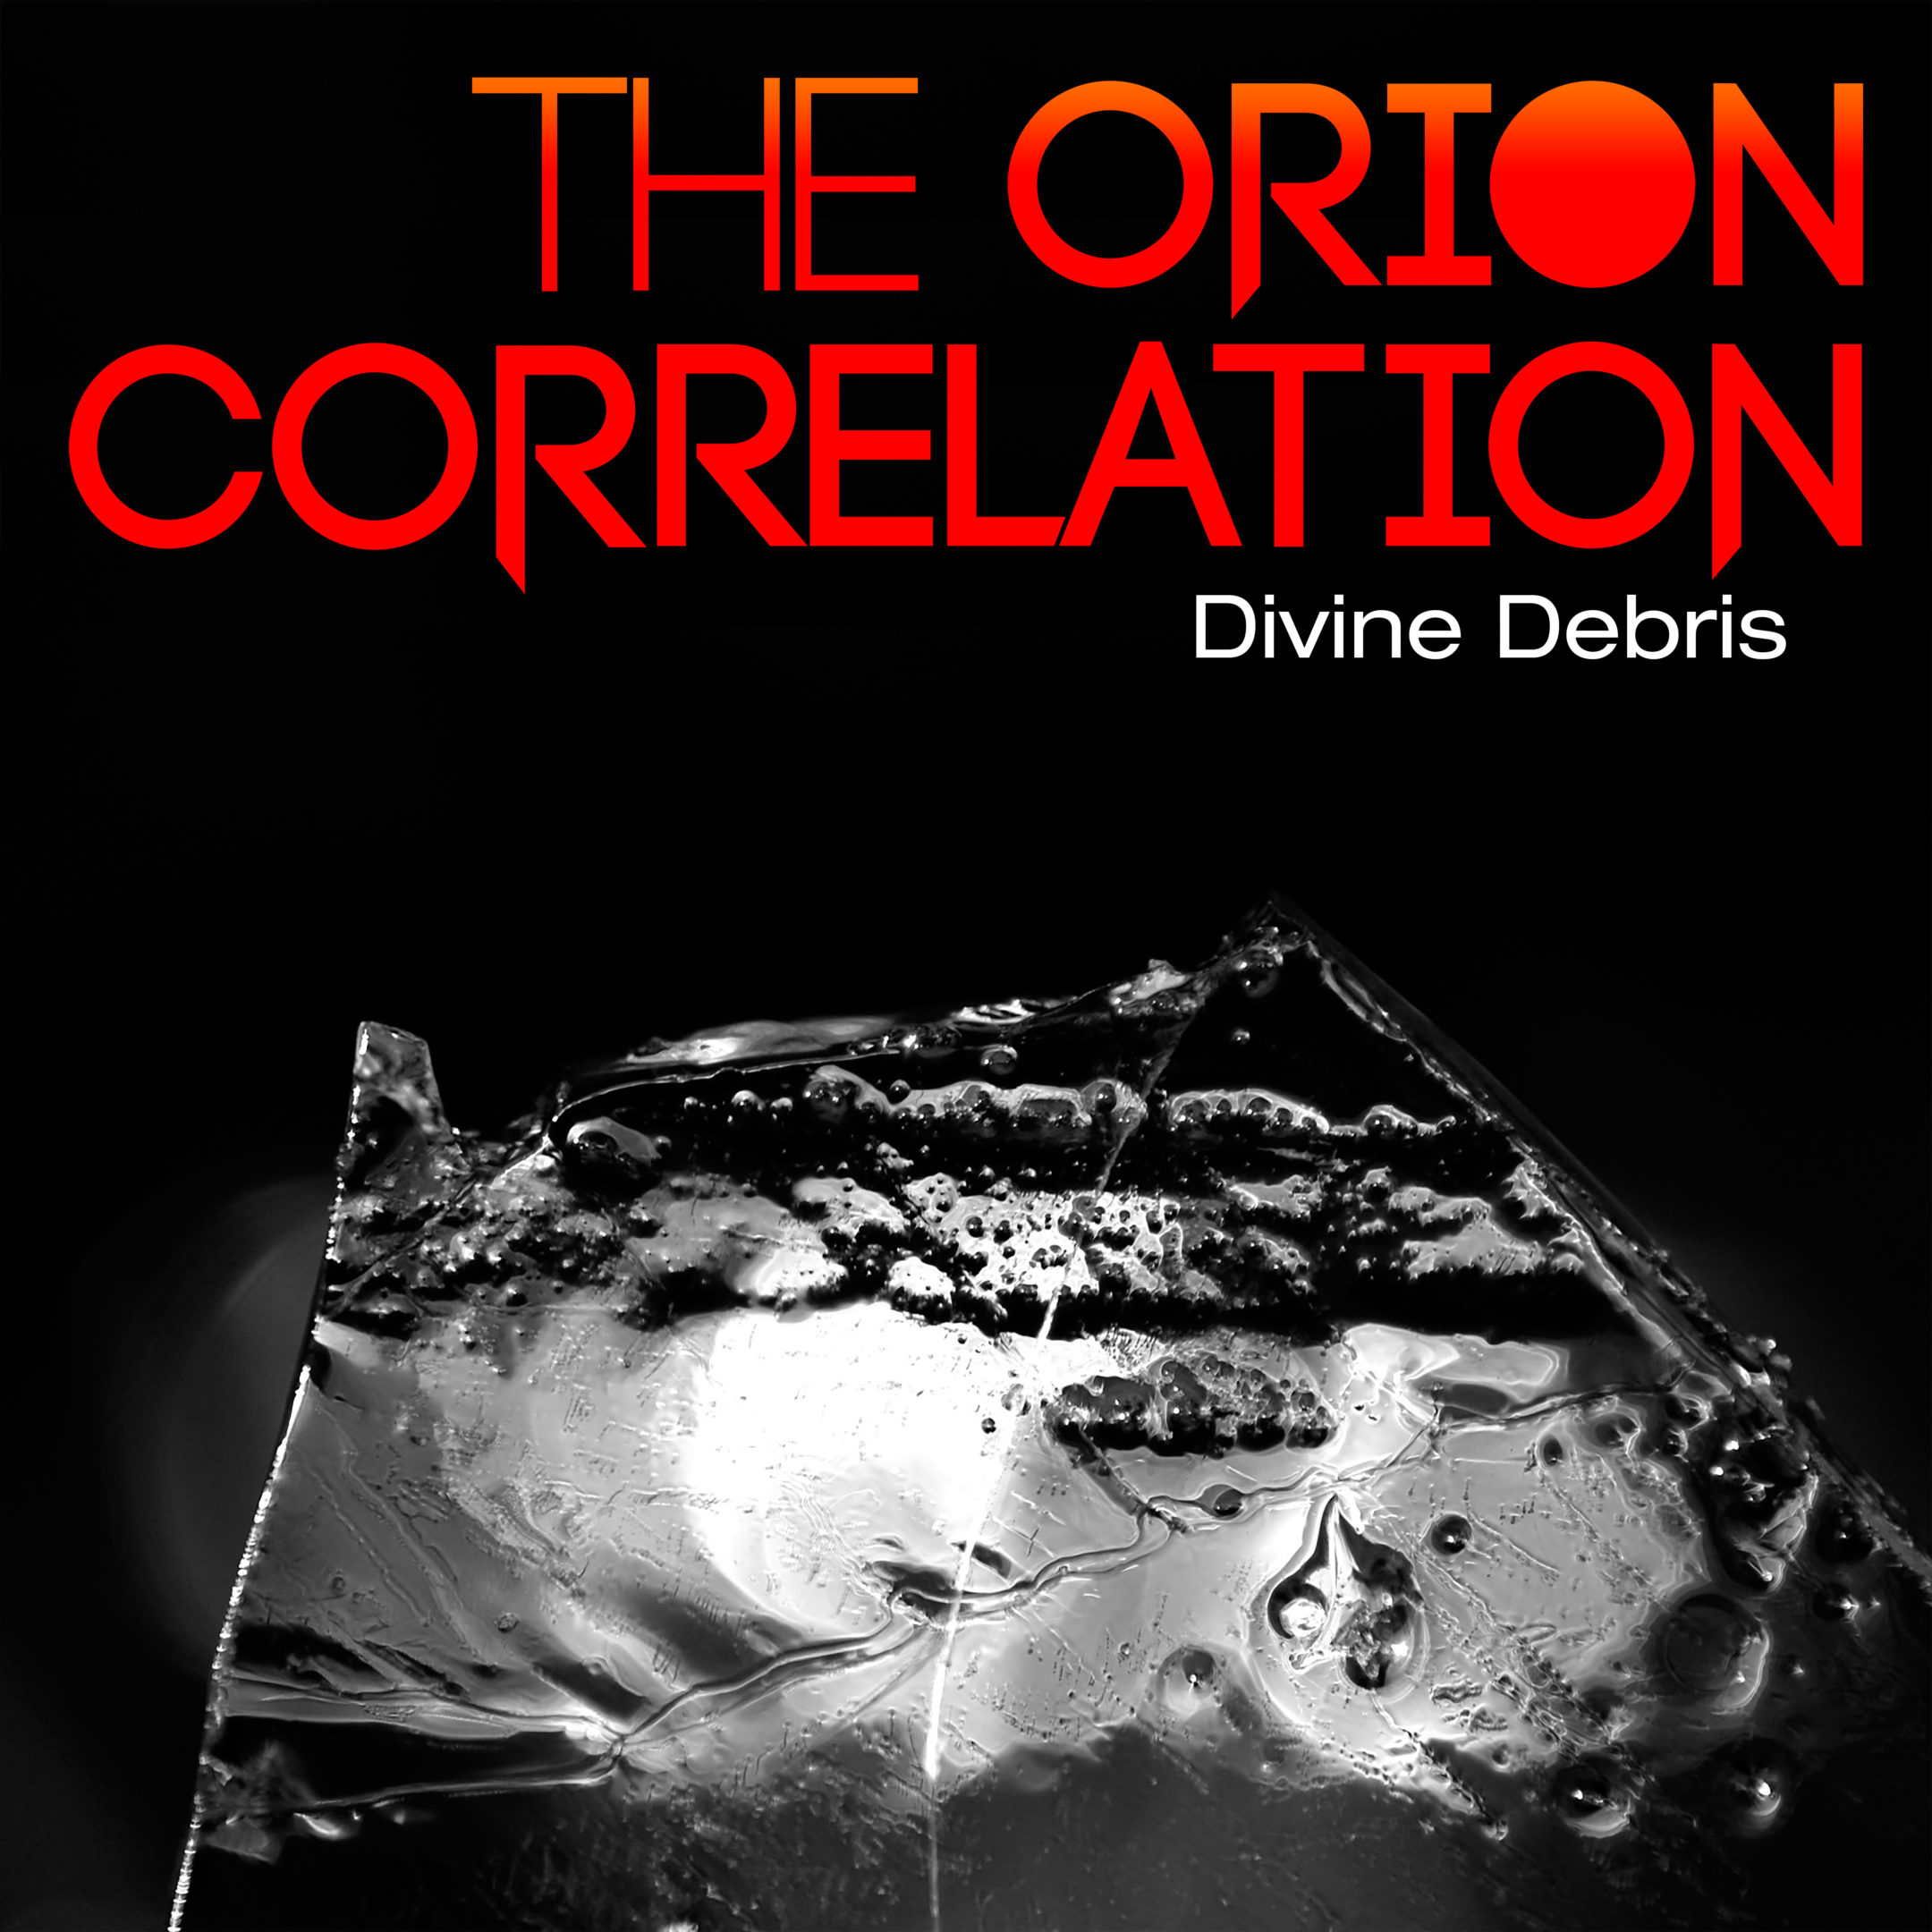 The Orion Correlation - Divine Debris (Artwork)